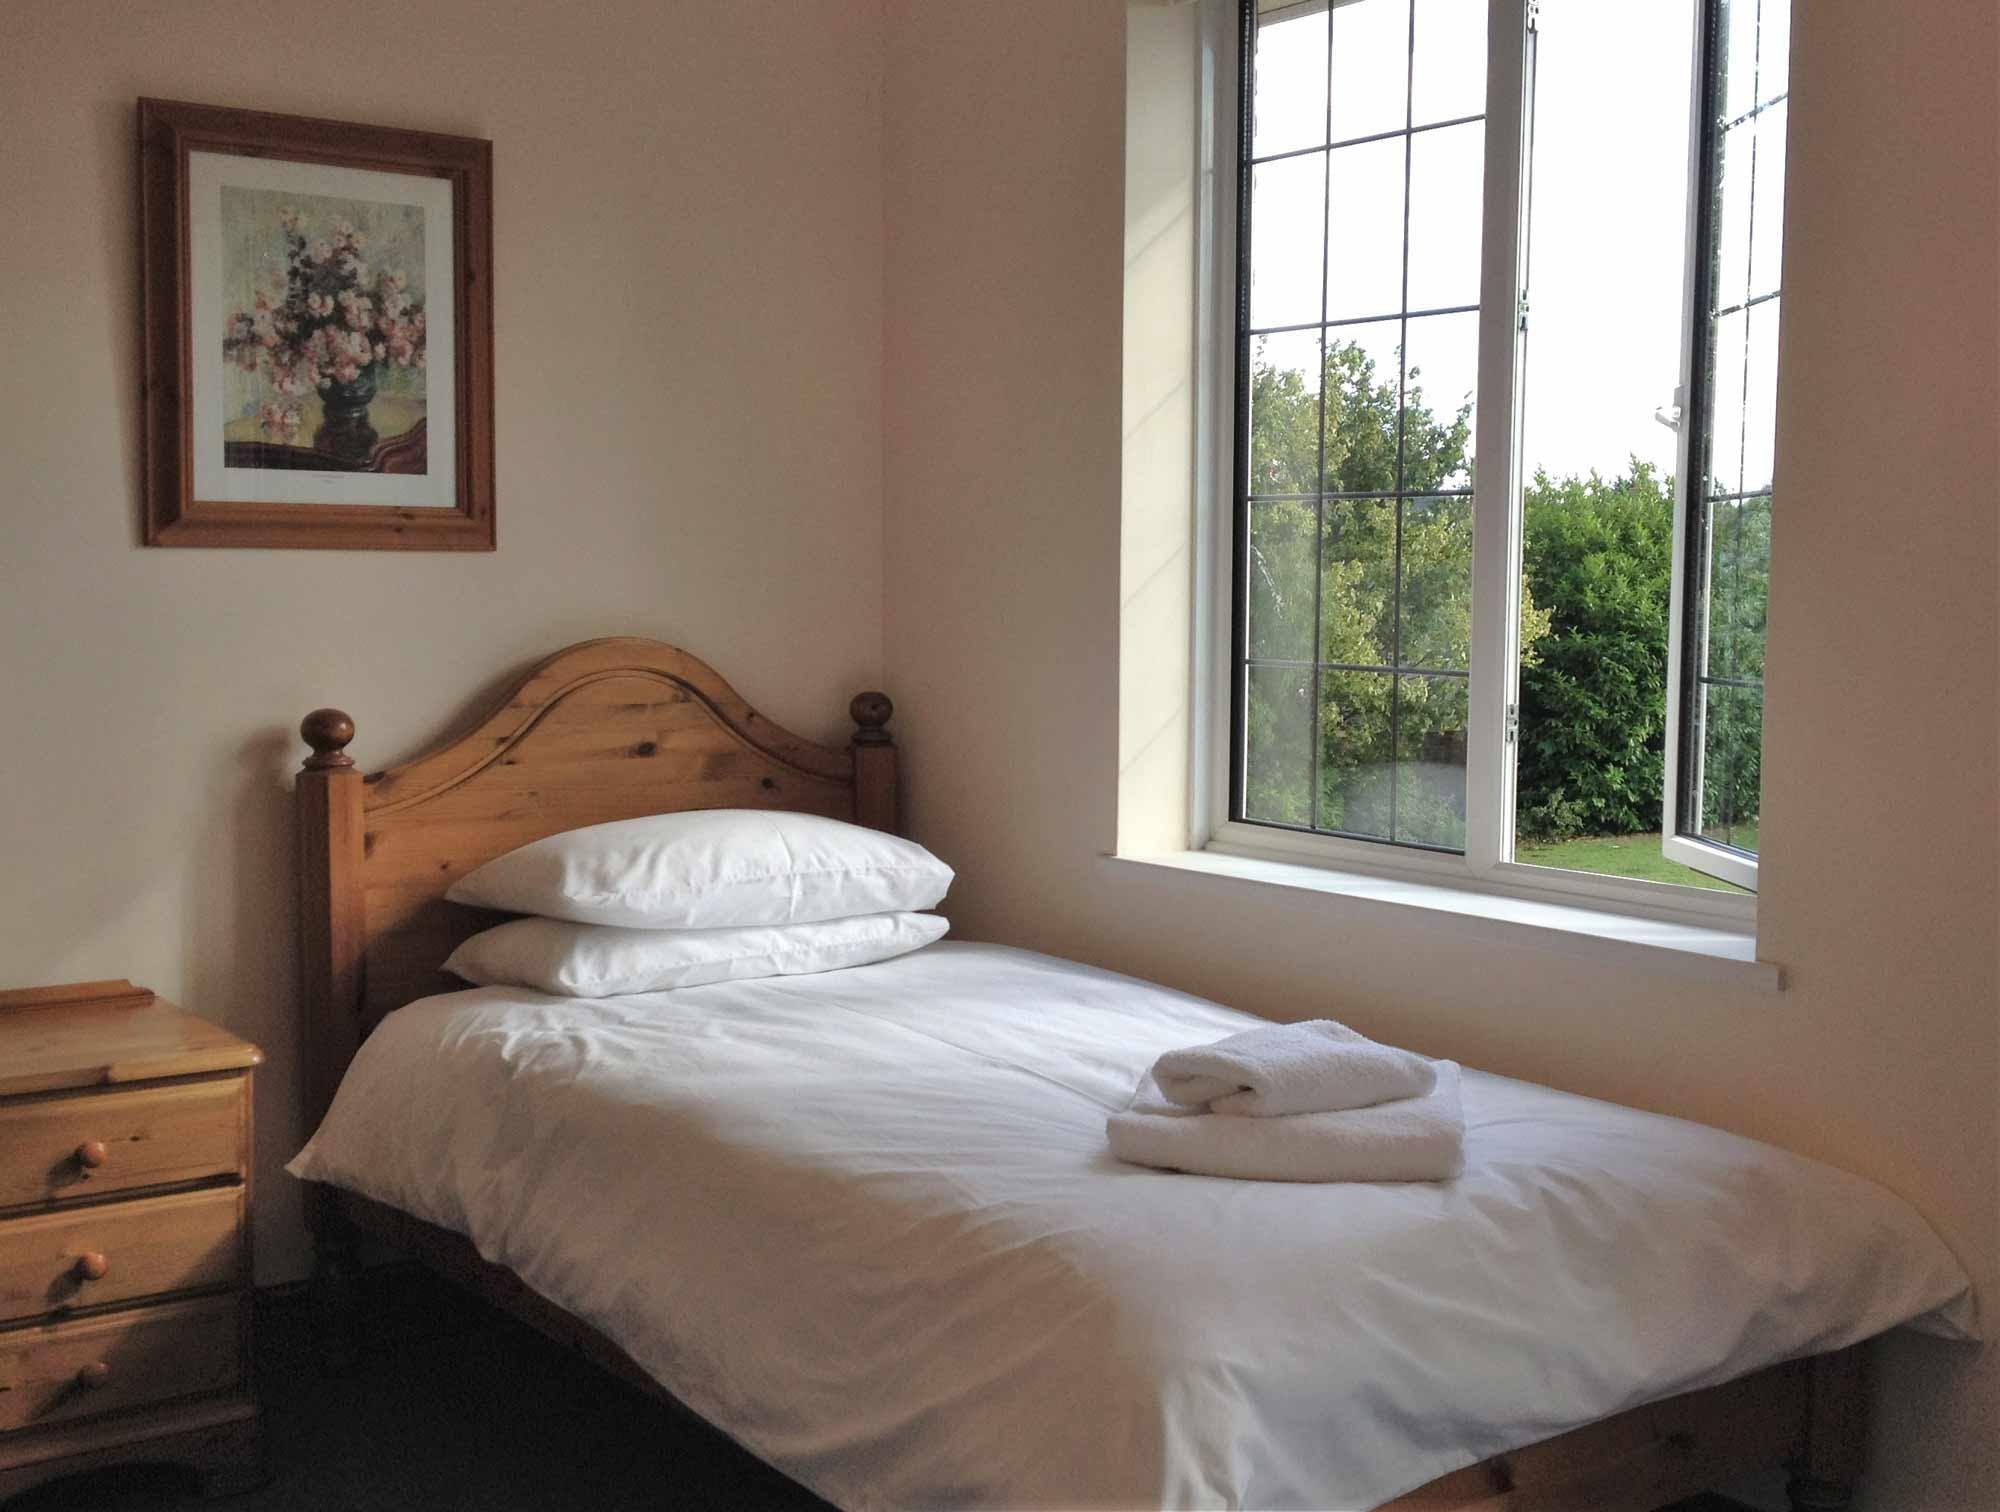 Student Residence Bedroom